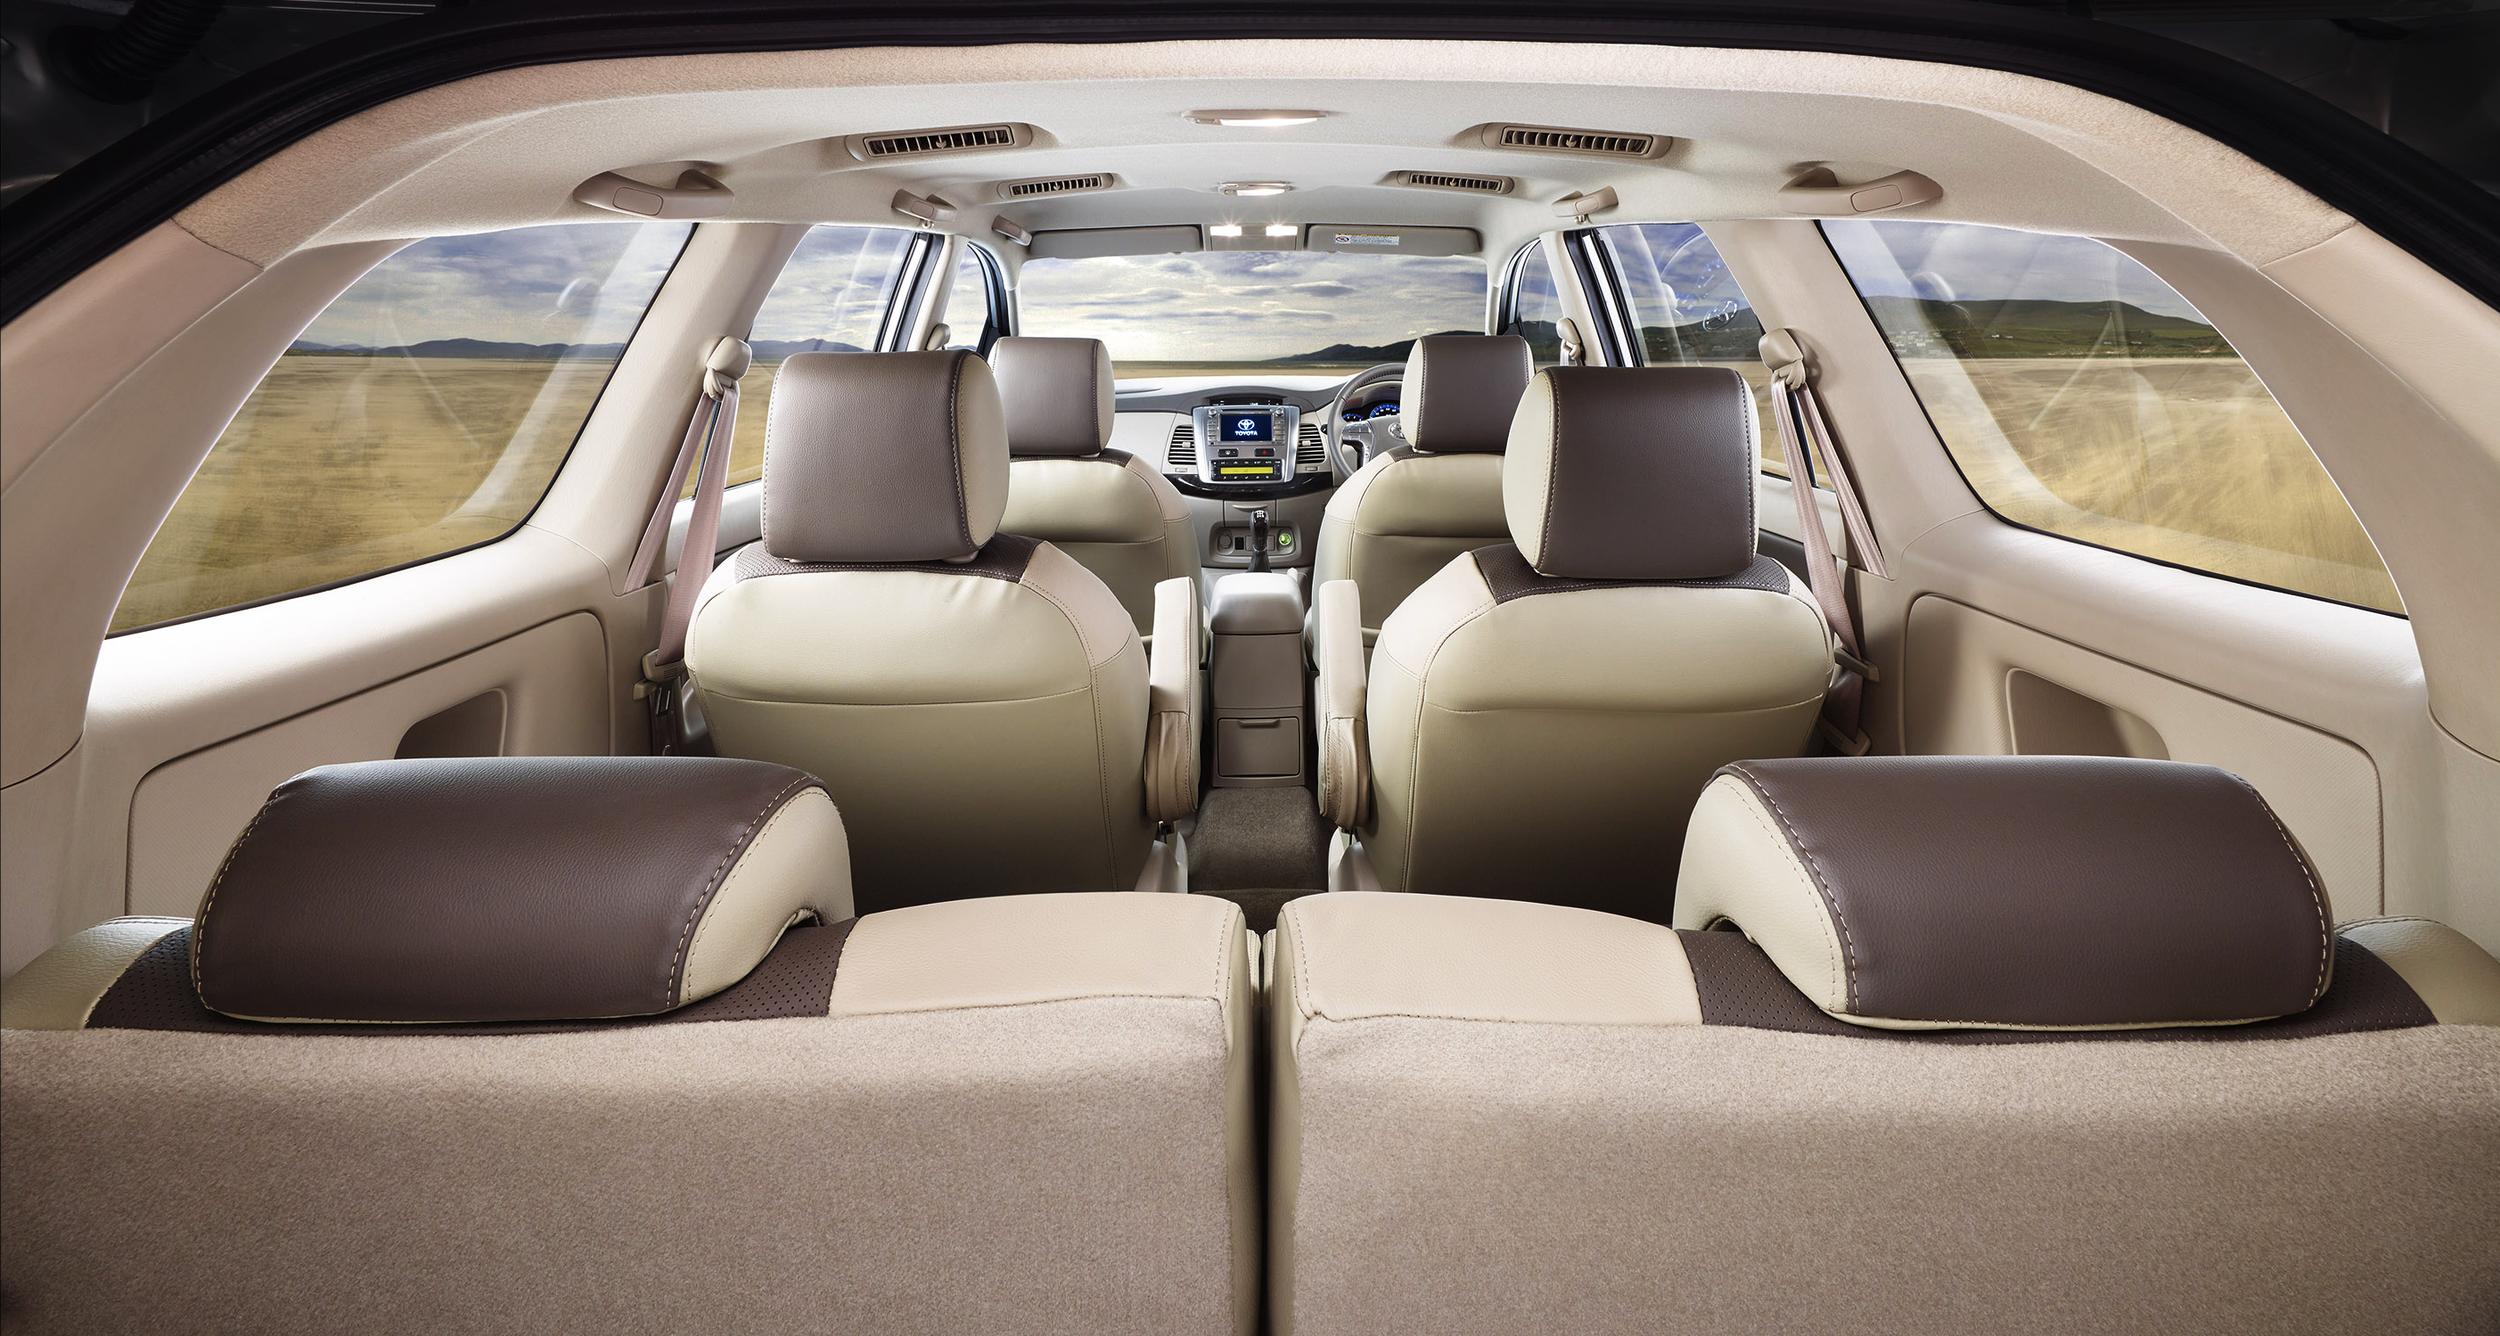 03-Interior seats-3.jpg